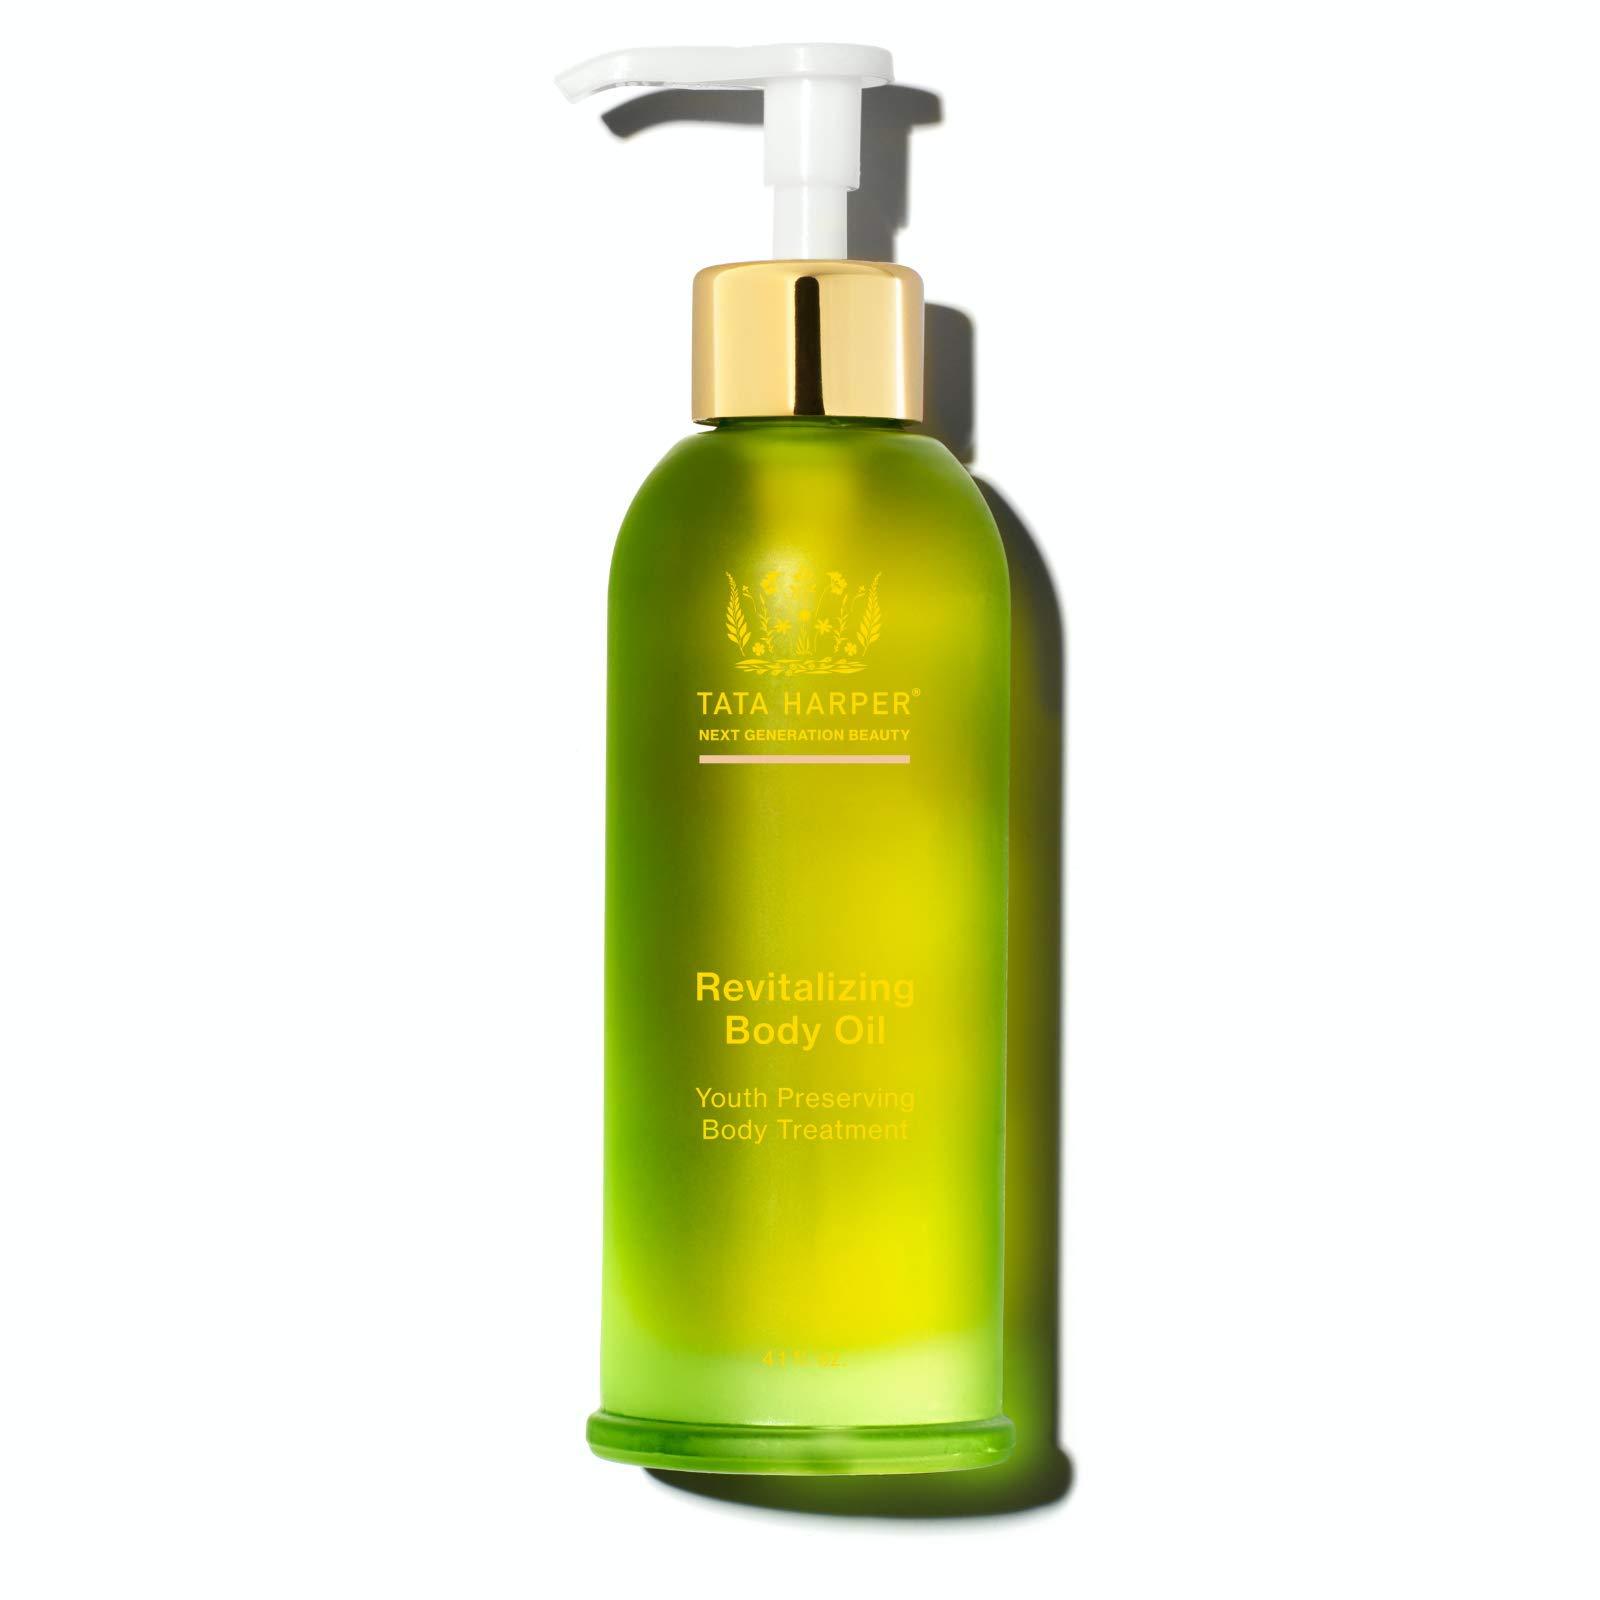 Tata Harper Revitalizing Body Oil For All Skin Types 4.1oz (125ml)